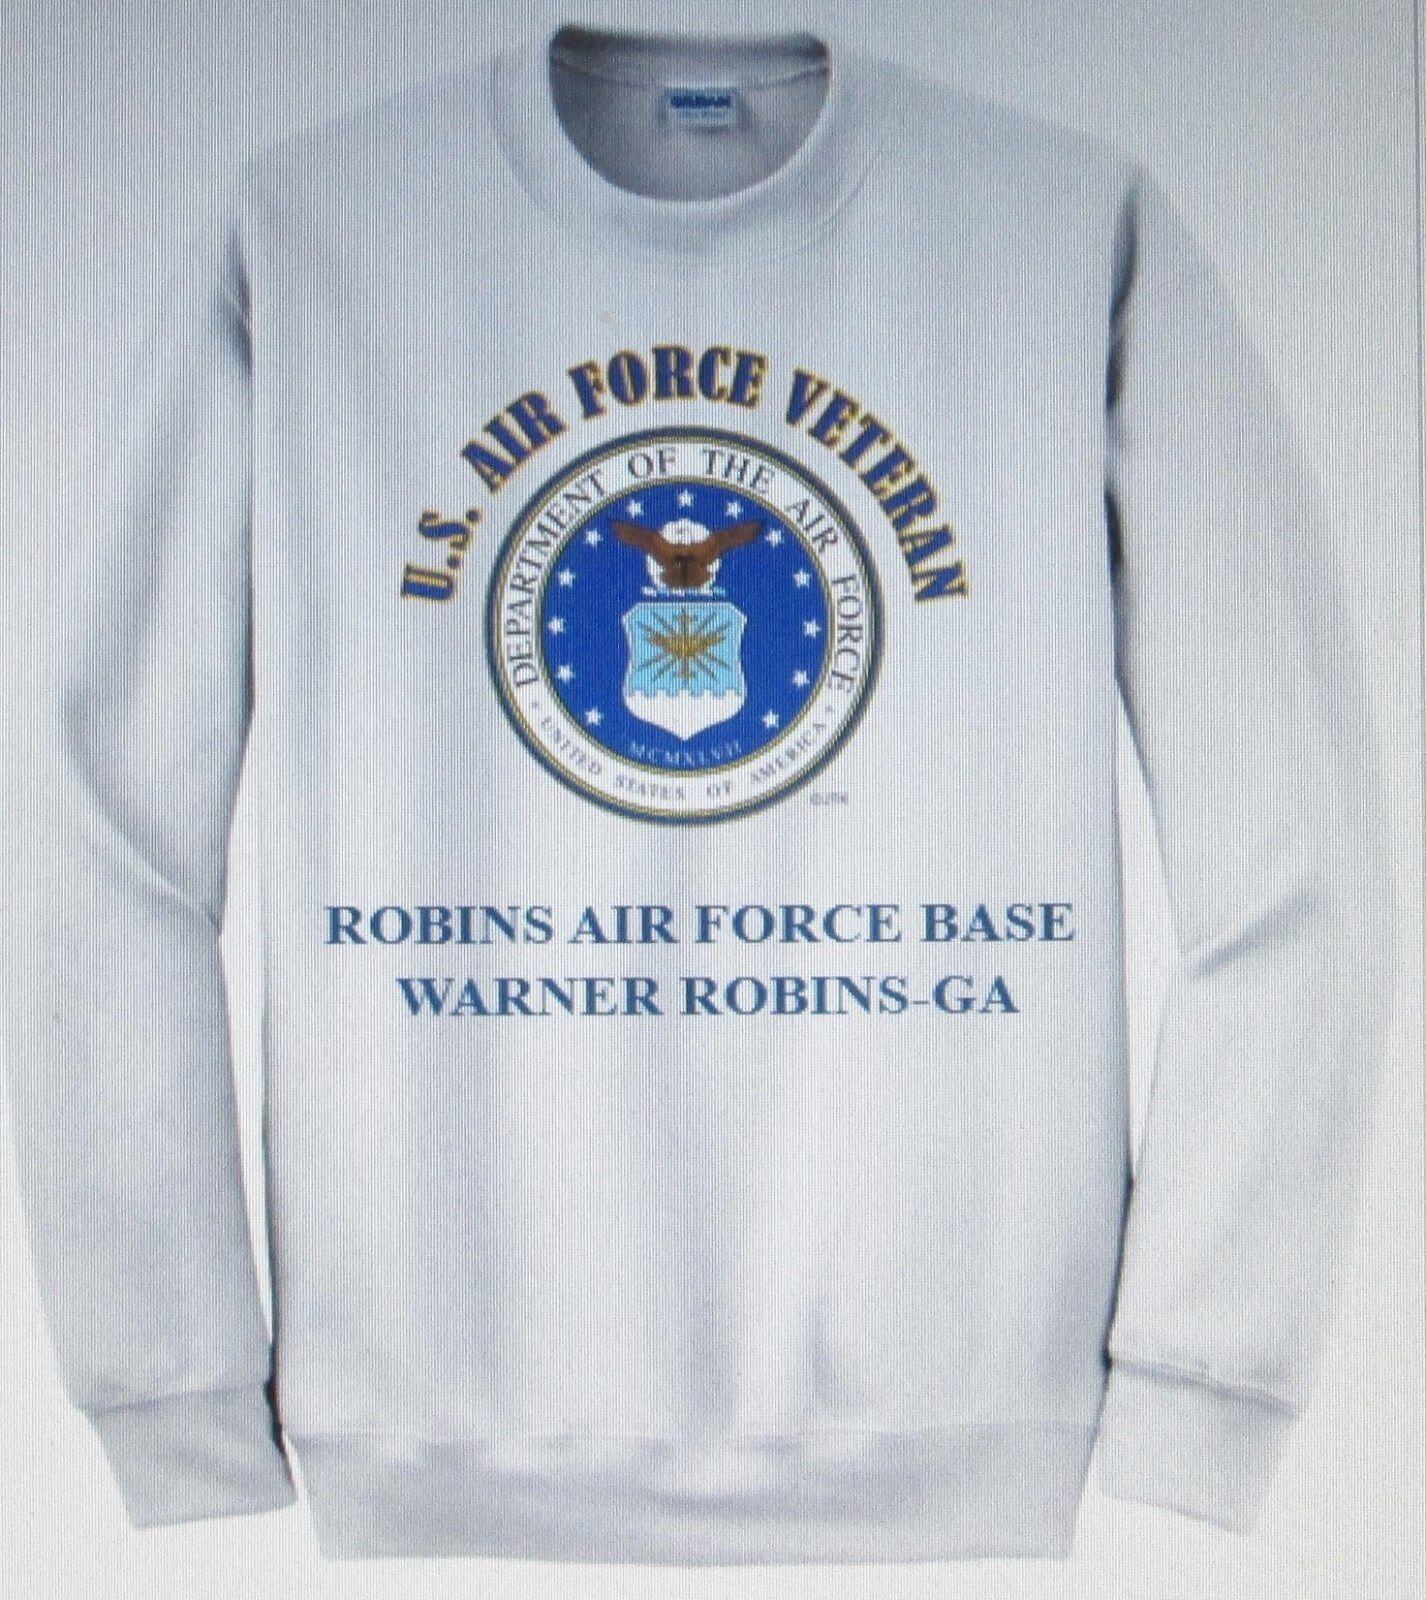 ROBINS AIR FORCE BASE  WARNER ROBINS-GA  AIR FORCE EMBLEM VETERAN SWEATSHIRT